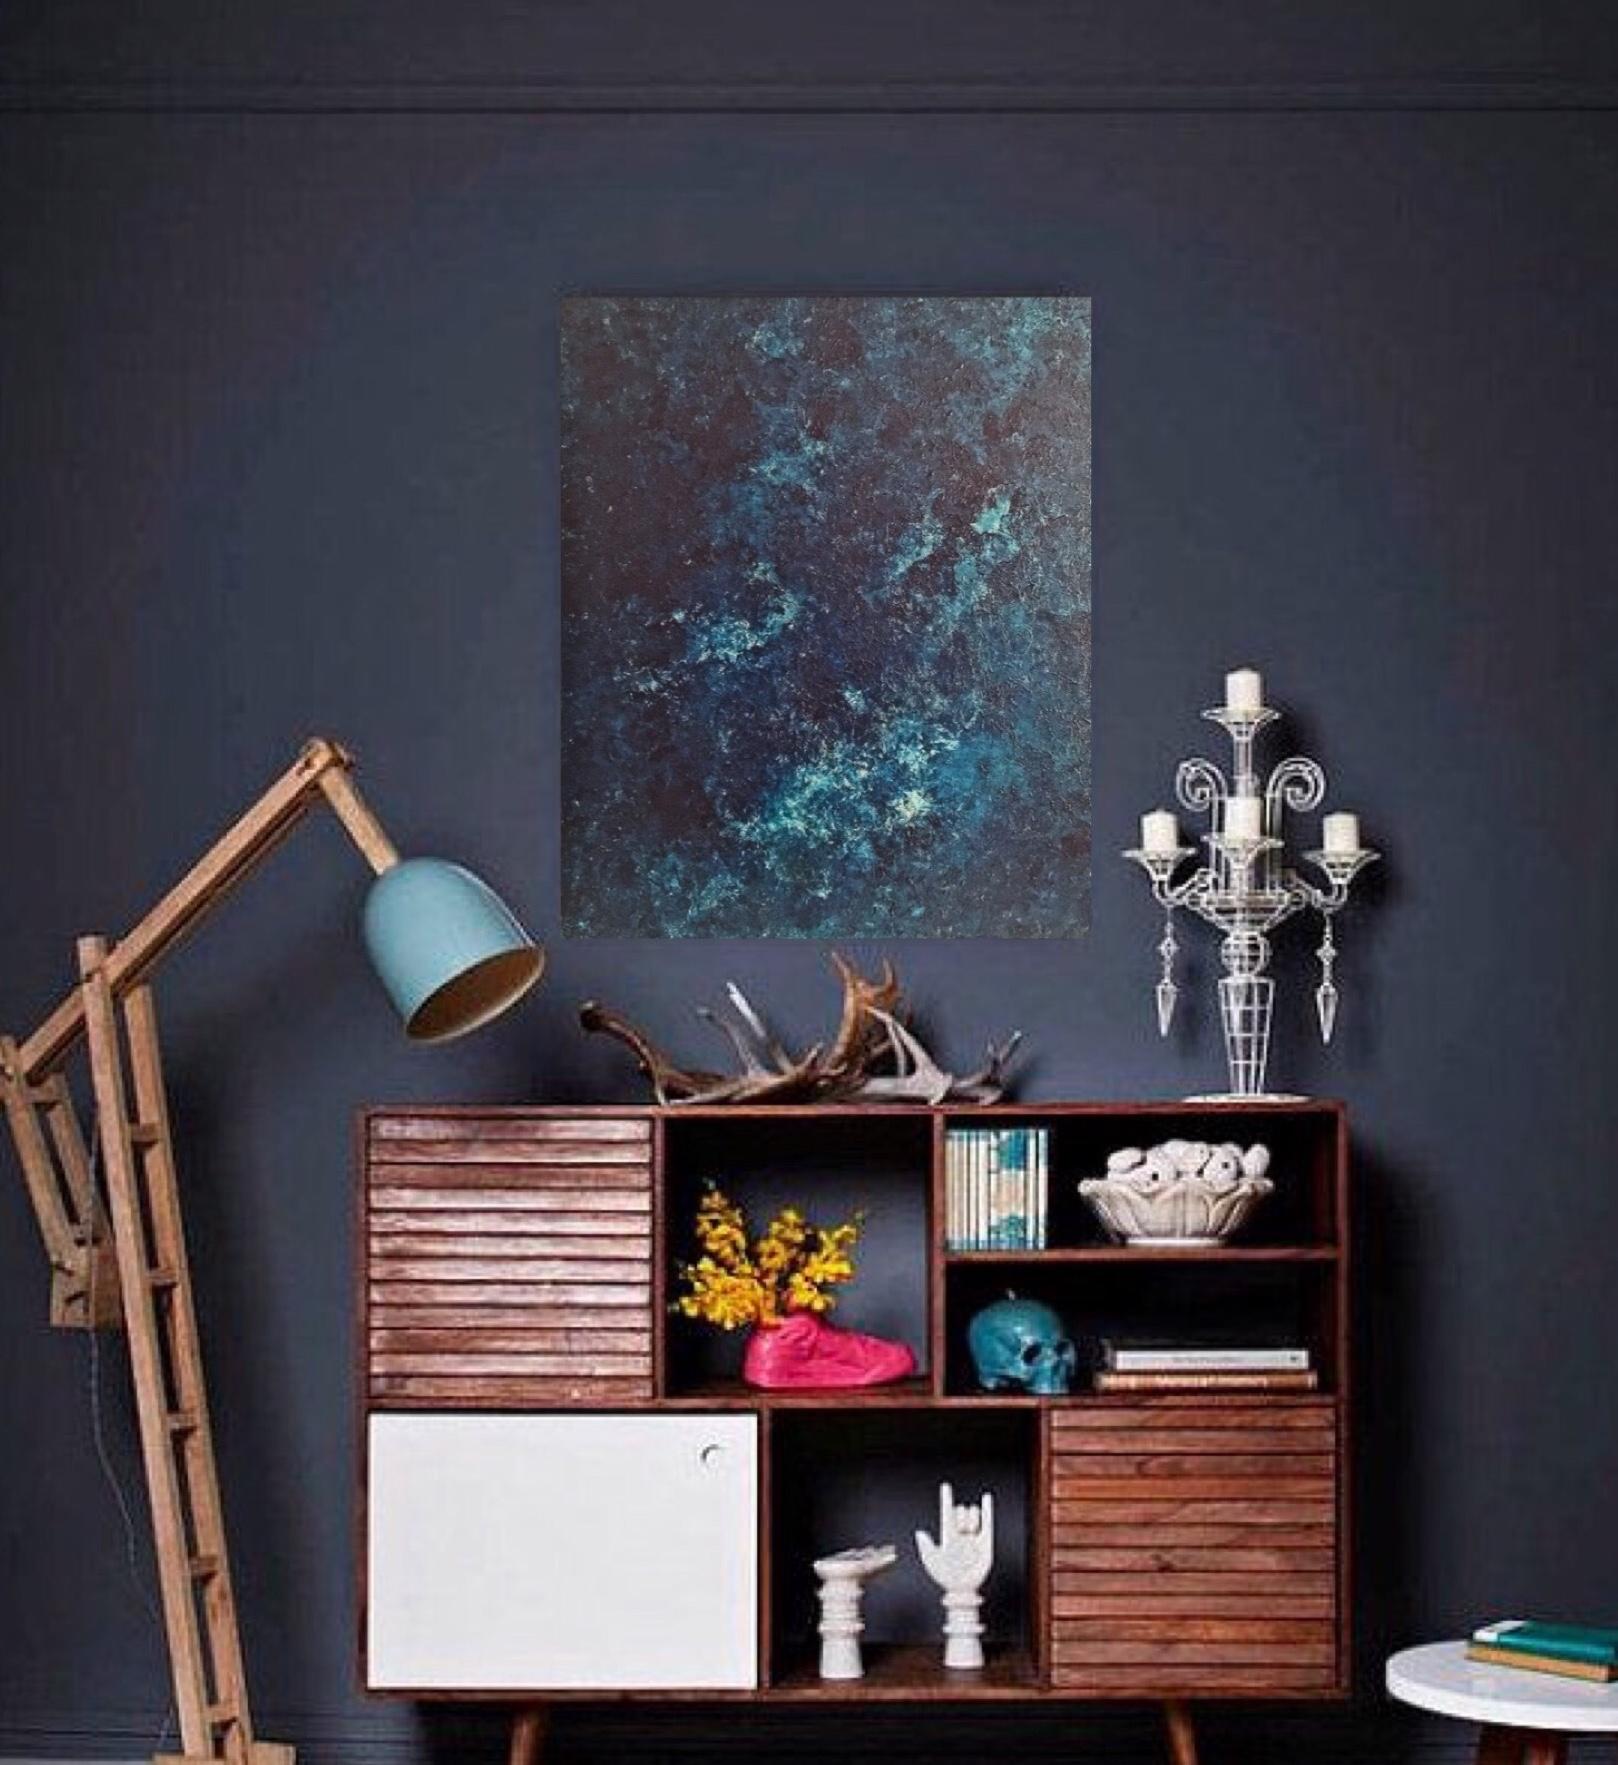 Marine Bonzom - Artiste Peintre Biarritz - Home - Deep